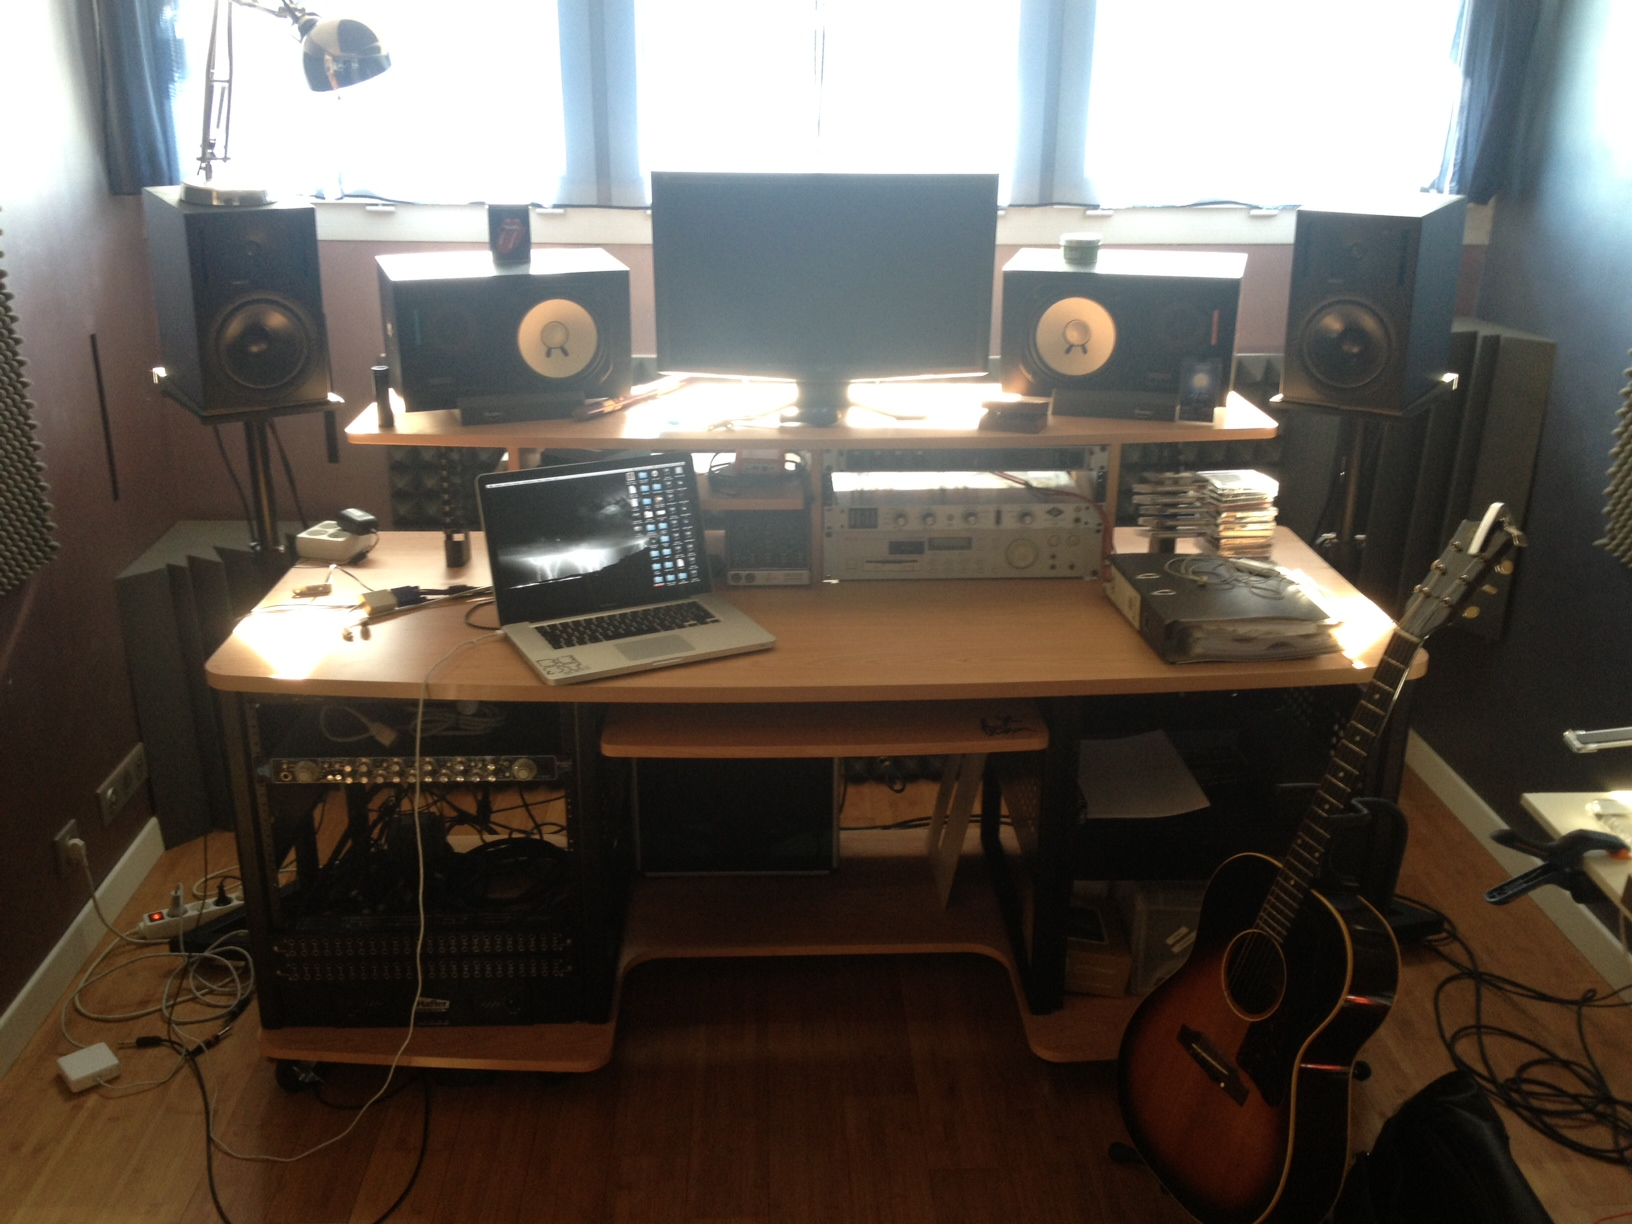 Studio Producer Desk : studio rta producer station image 1123624 audiofanzine ~ Russianpoet.info Haus und Dekorationen